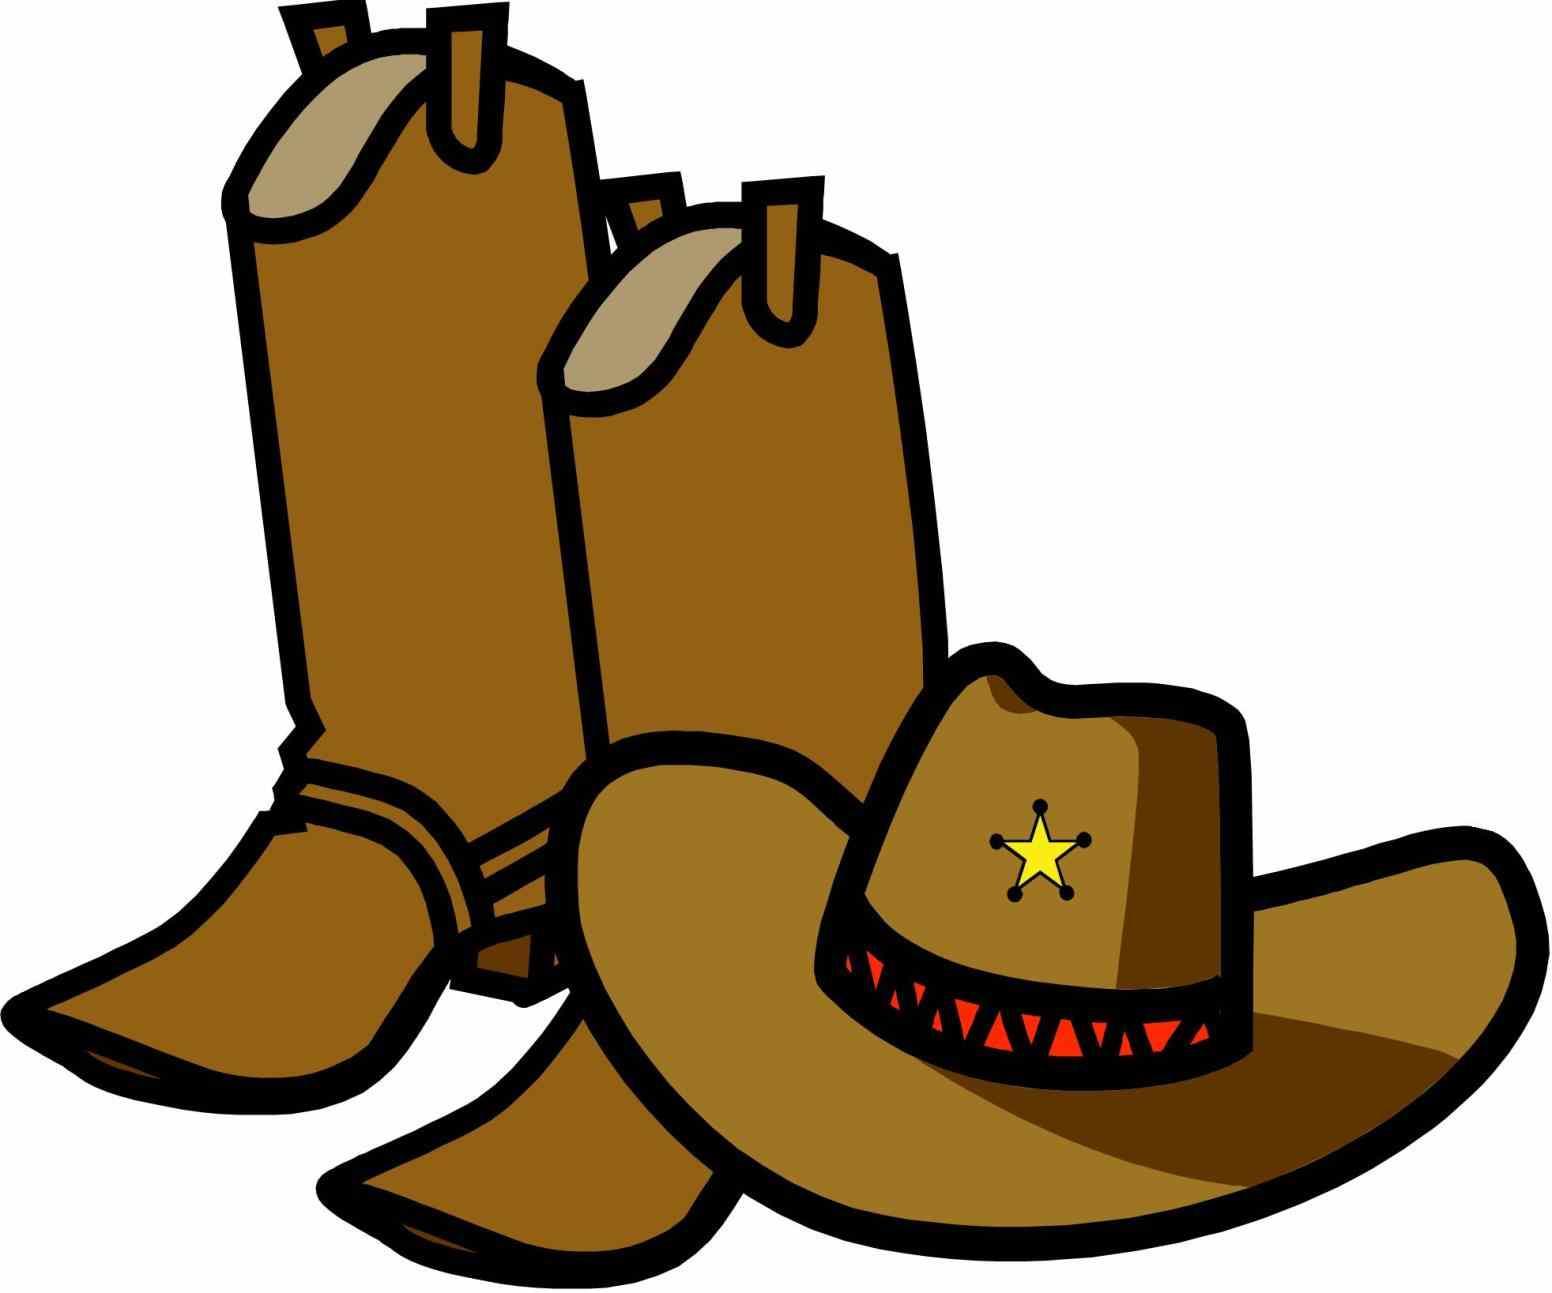 cowboy hat and boots drawing at getdrawings com free for personal rh getdrawings com cowboy boots clip art free cowboy boots clipart free